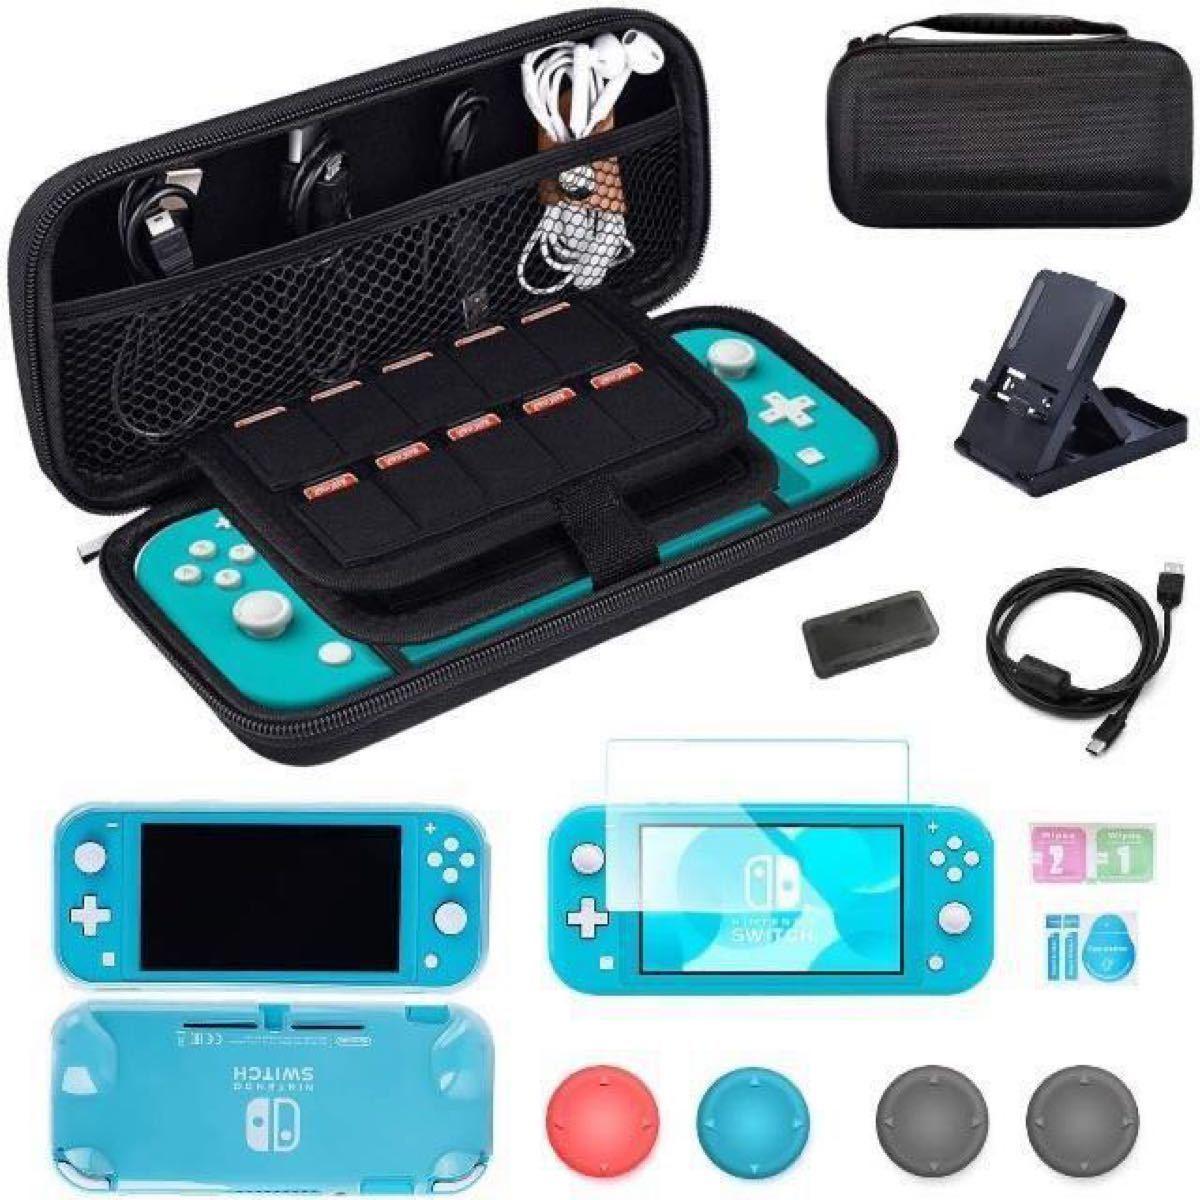 Nintendo Switch 任天堂スイッチケース 任天堂スイッチ ガラスフィルム